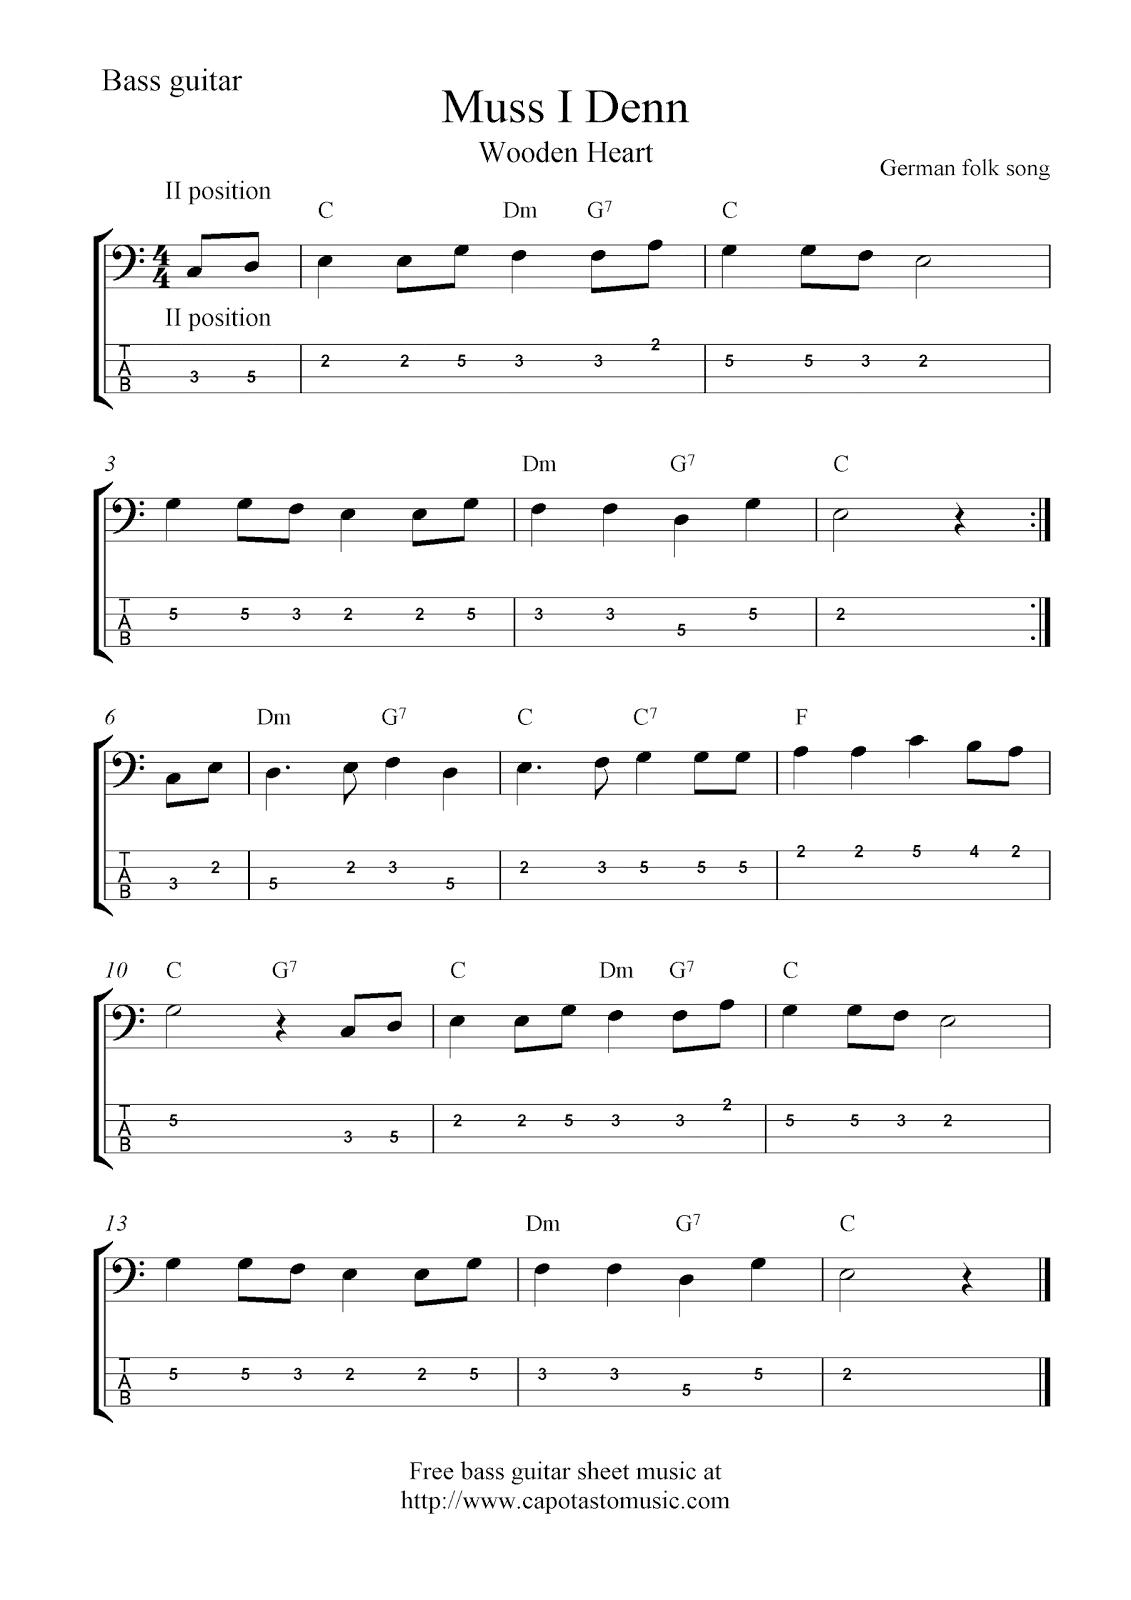 Guitar chords sheet music sheets chords tablature and song free bass guitar tab sheet music muss i denn wooden heart hexwebz Choice Image